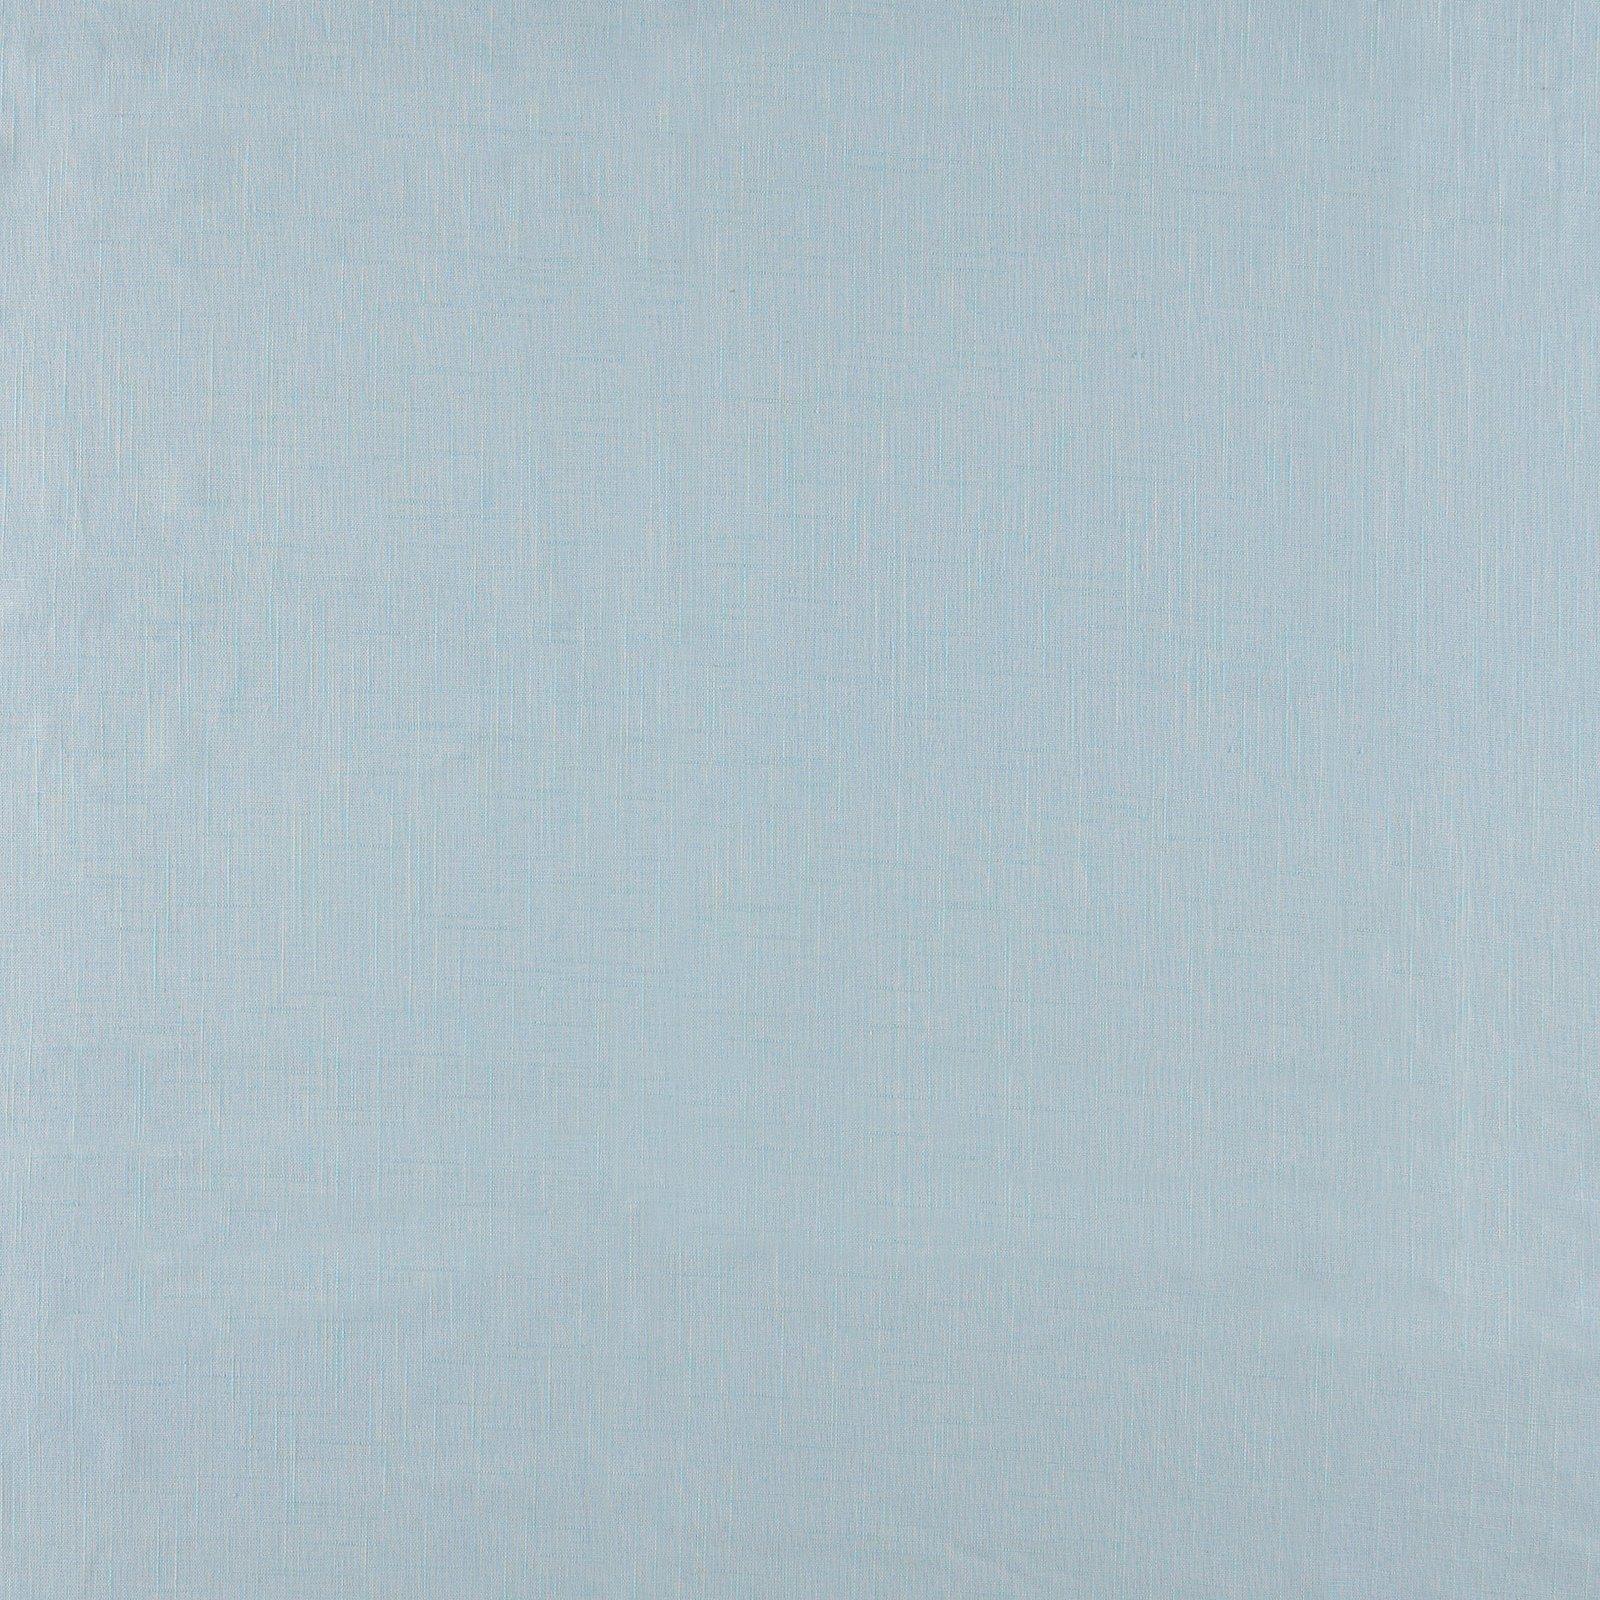 Coarse linen/viscose light blue 852309_pack_solid